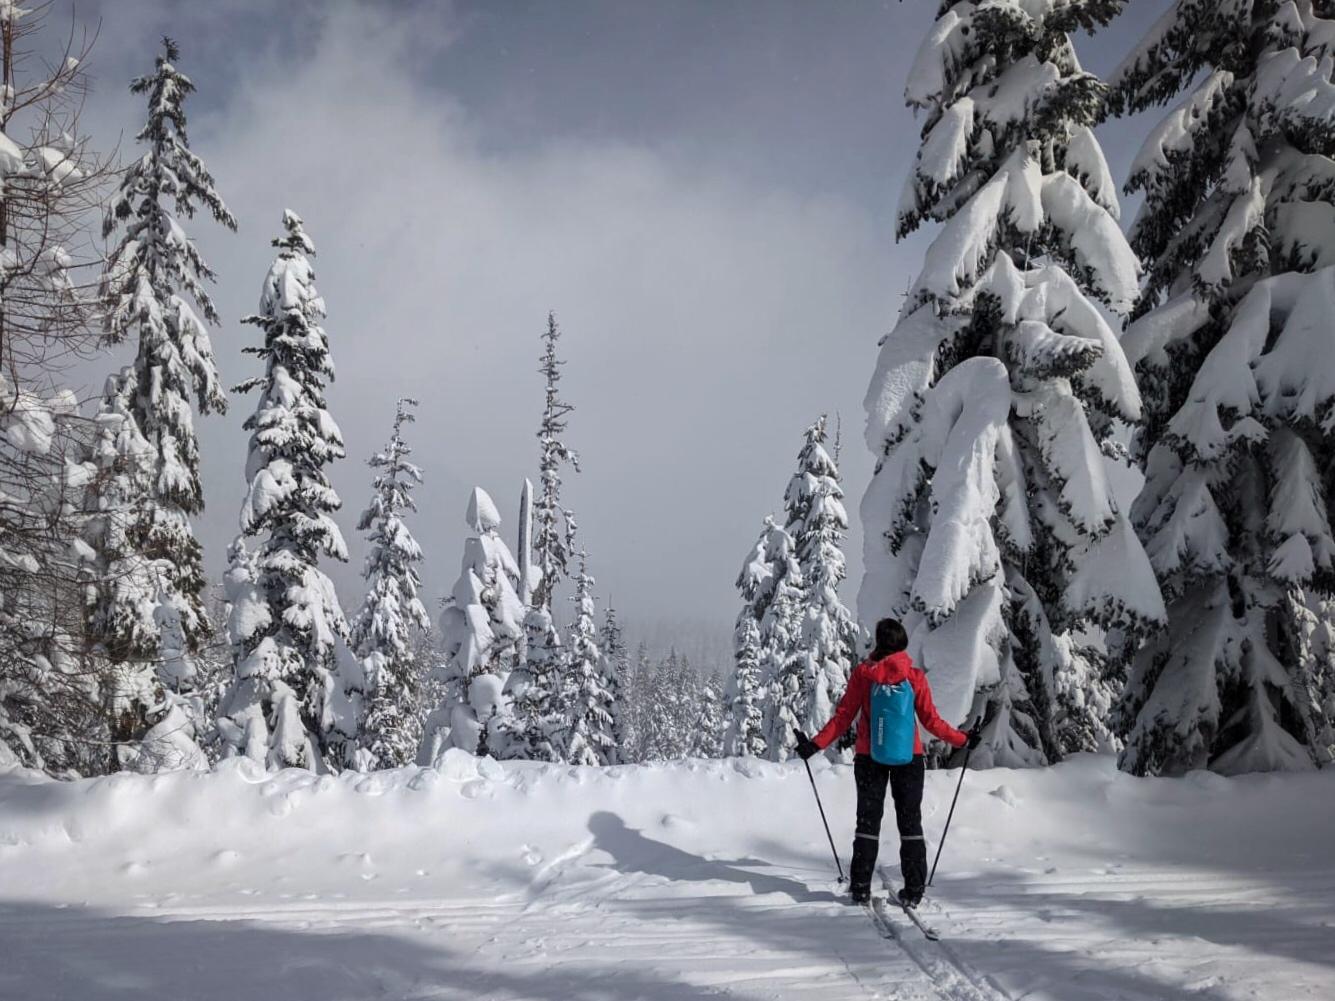 Crosscountry skiing on mount hood near portland oregon